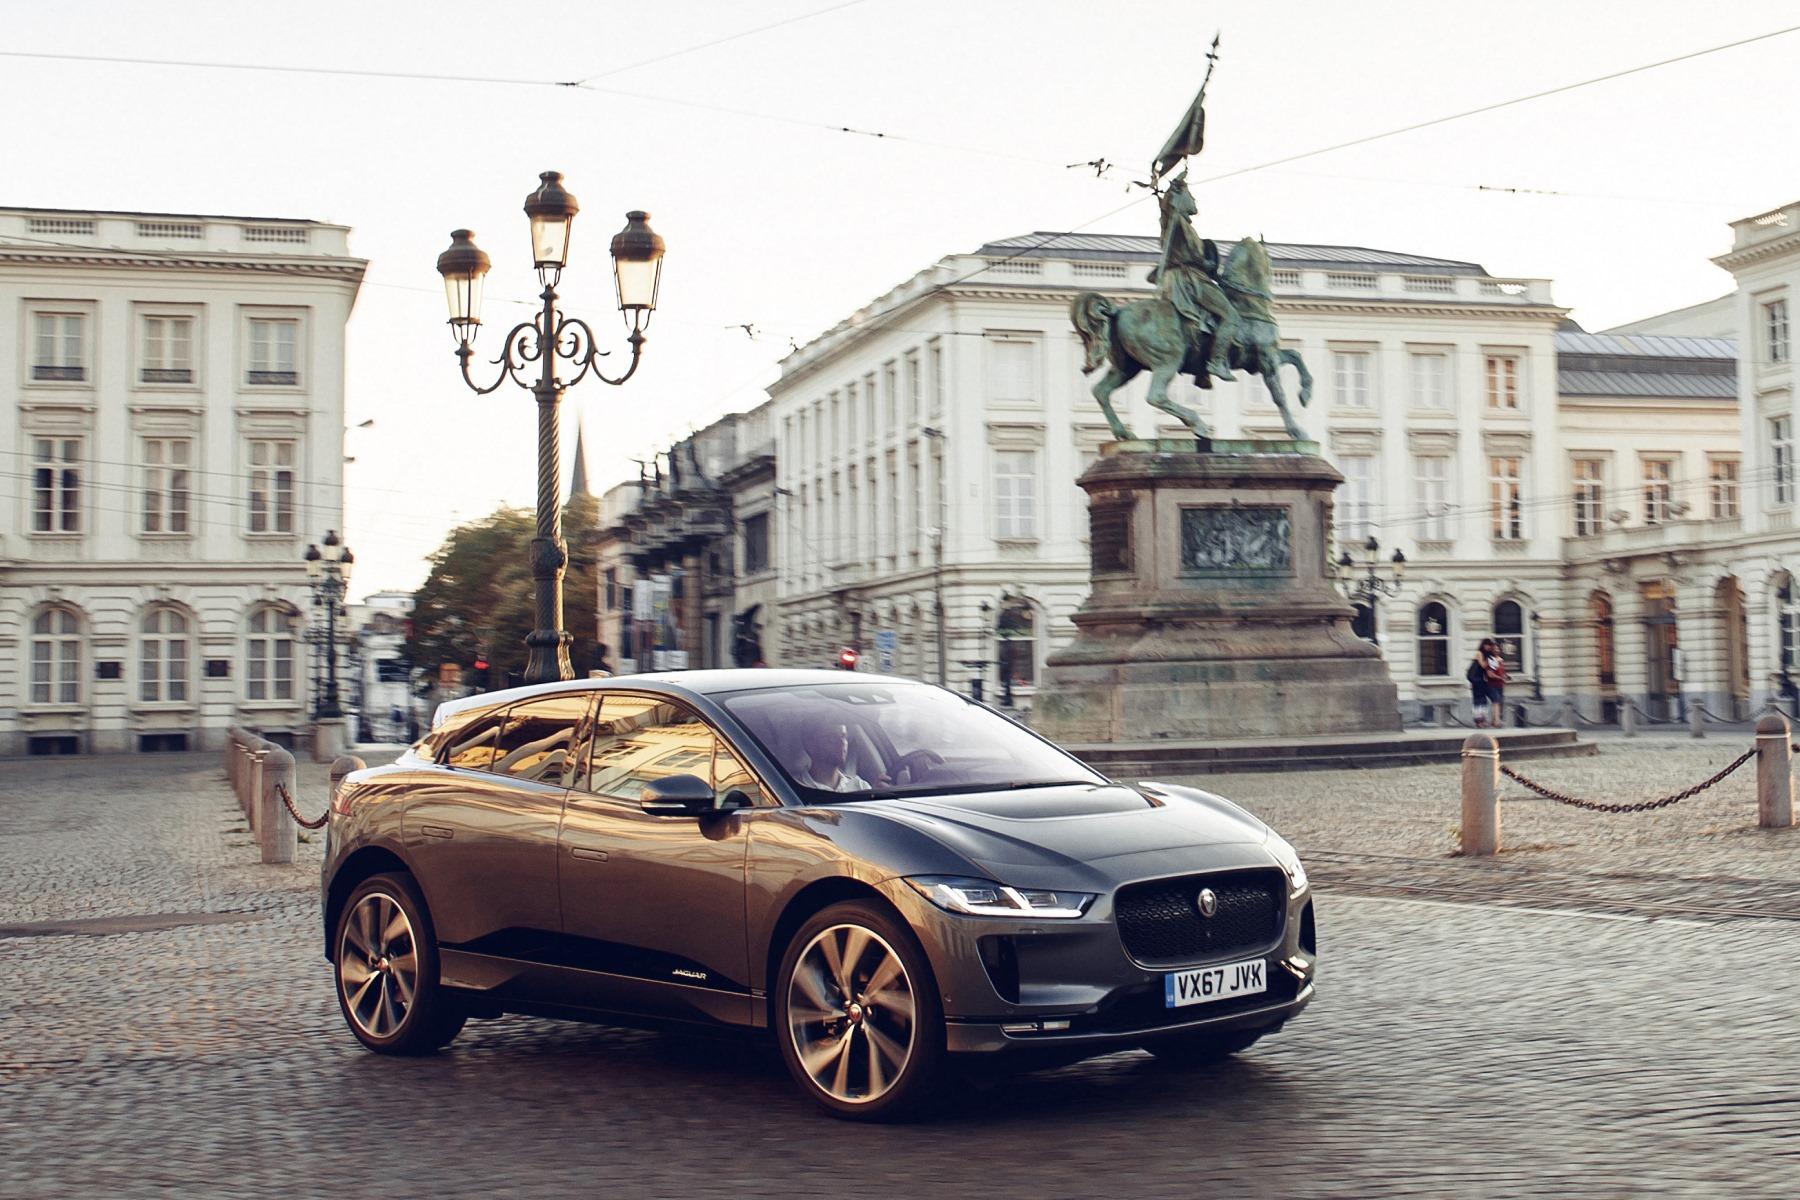 Jaguar I-Pace in Brussels